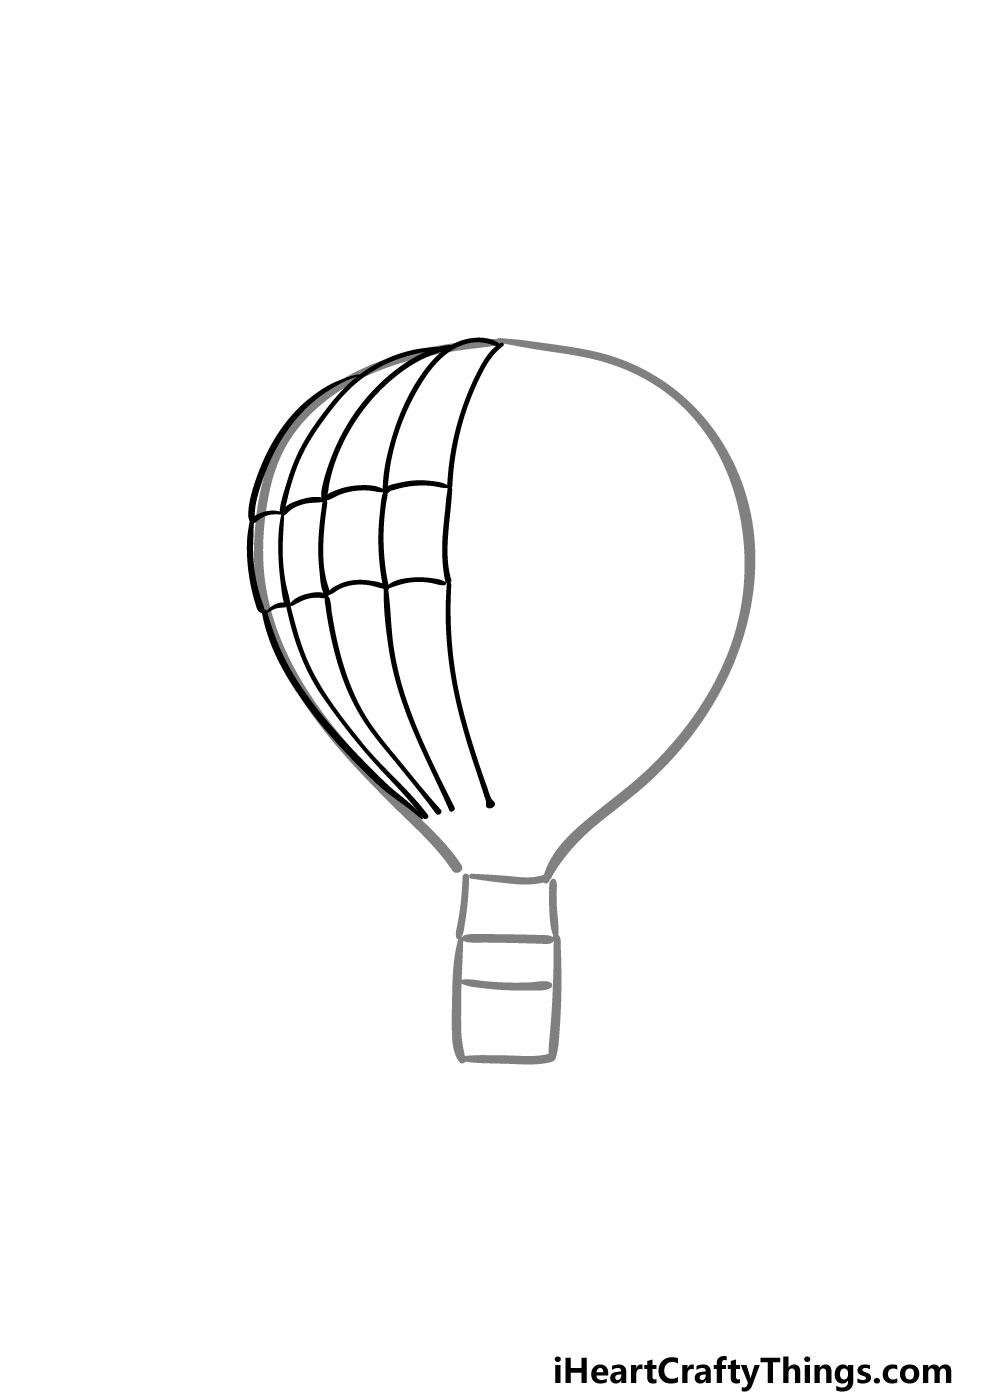 drawing a hot air balloon step 2